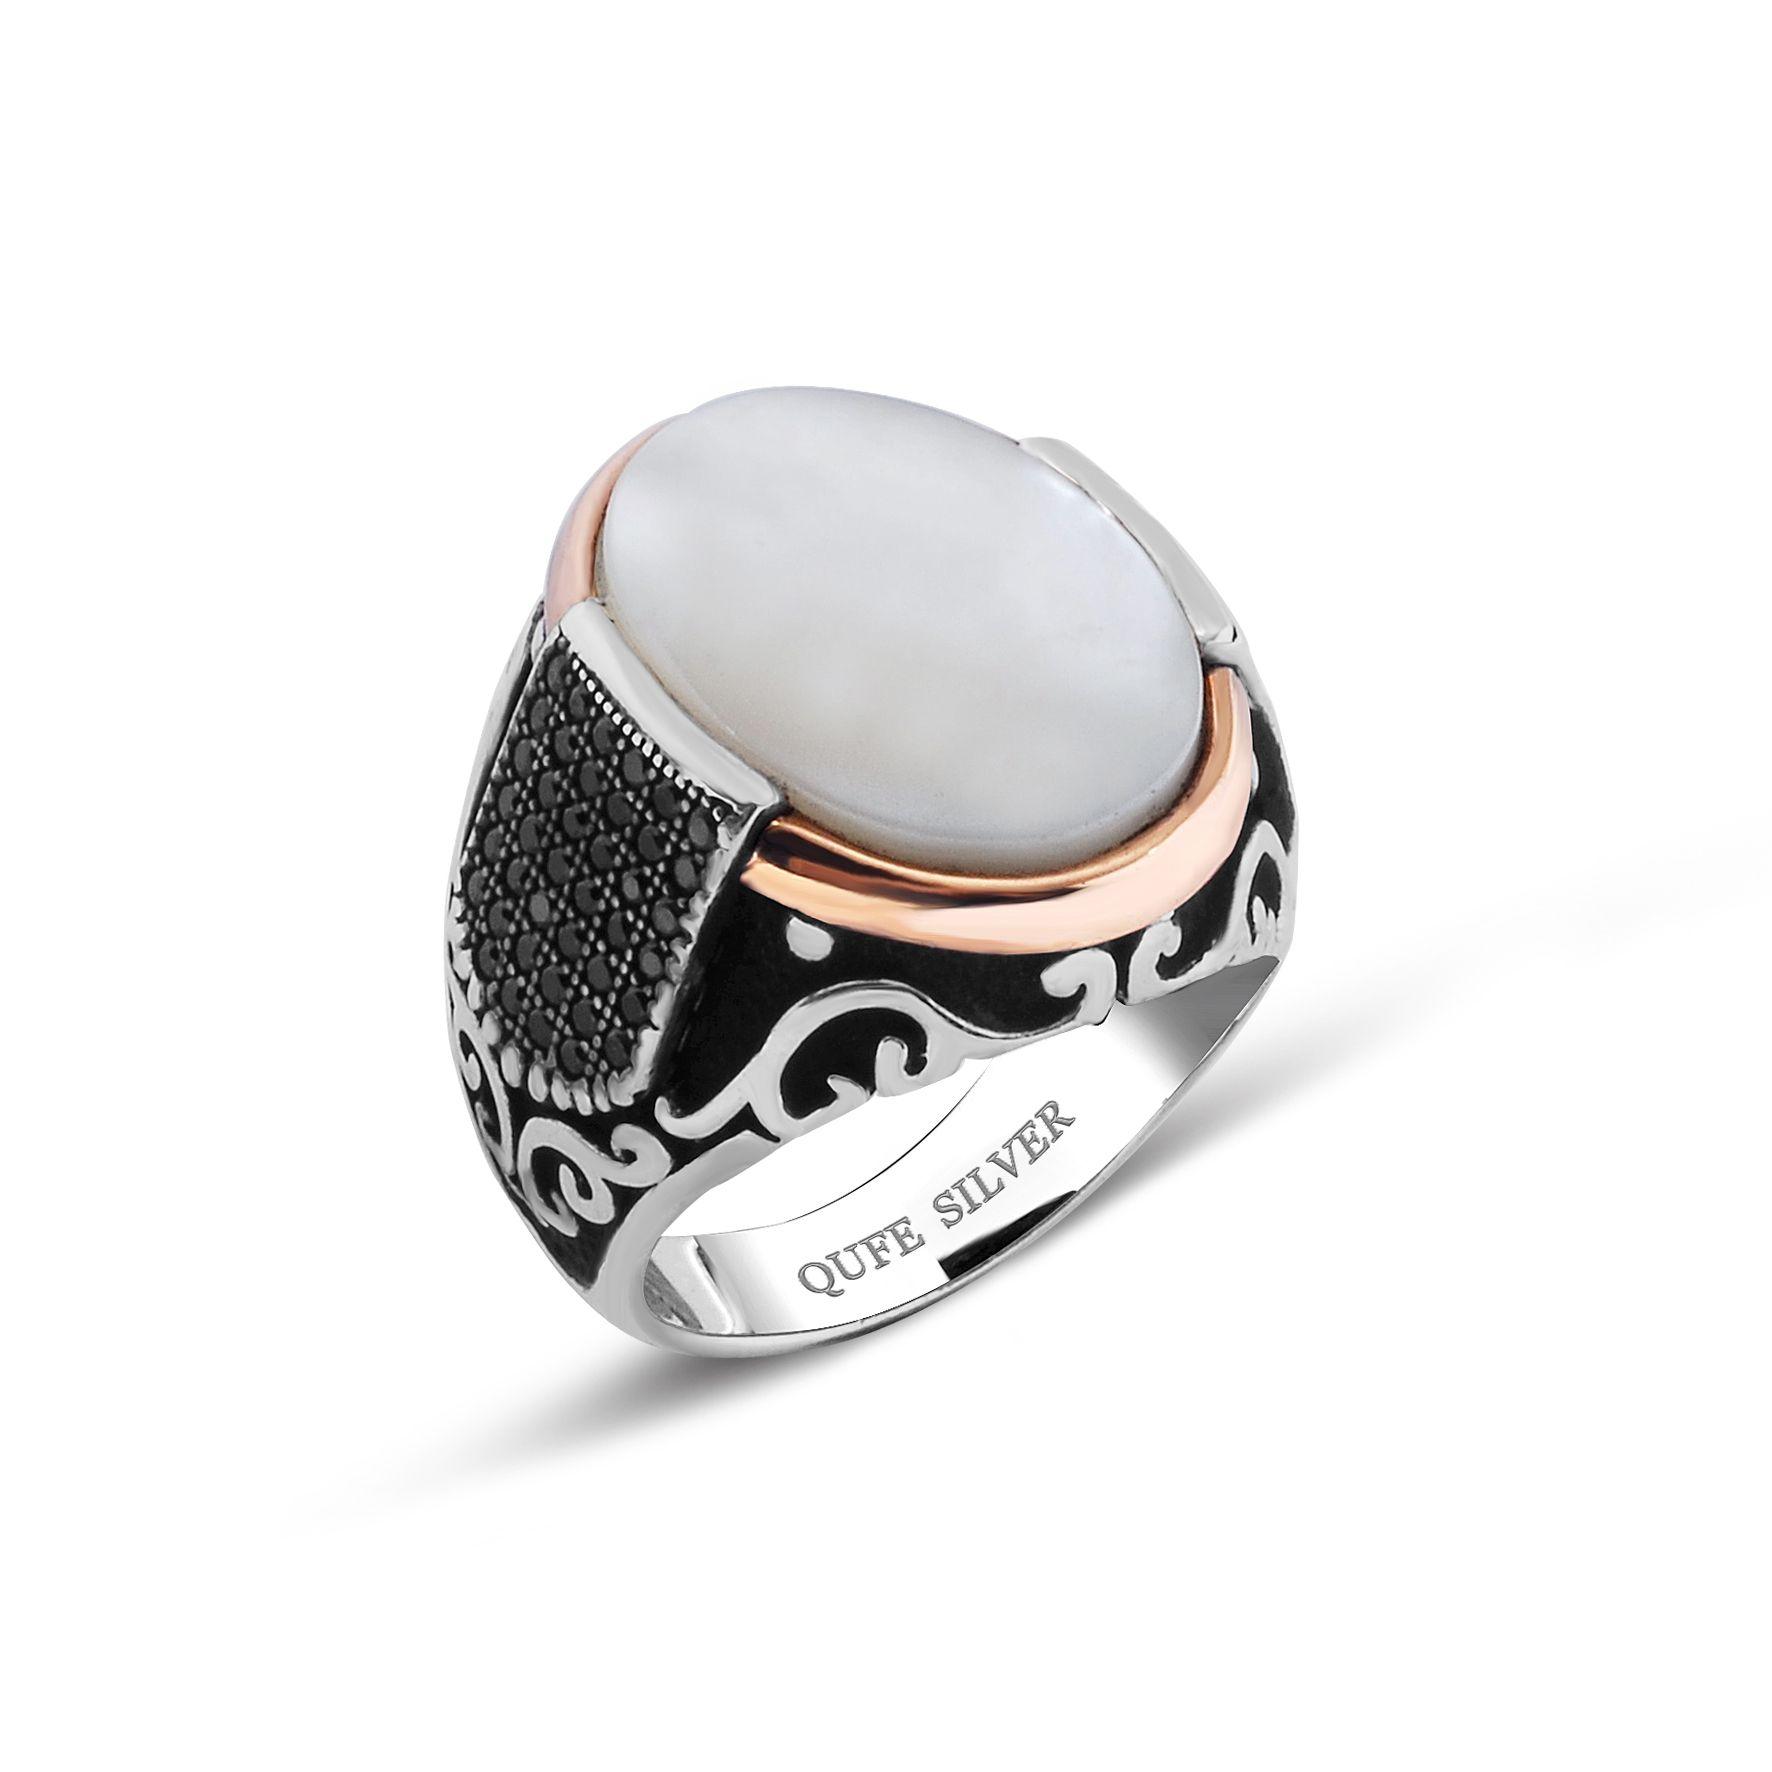 Mother of pearl and black zirkon stones 925k sterling